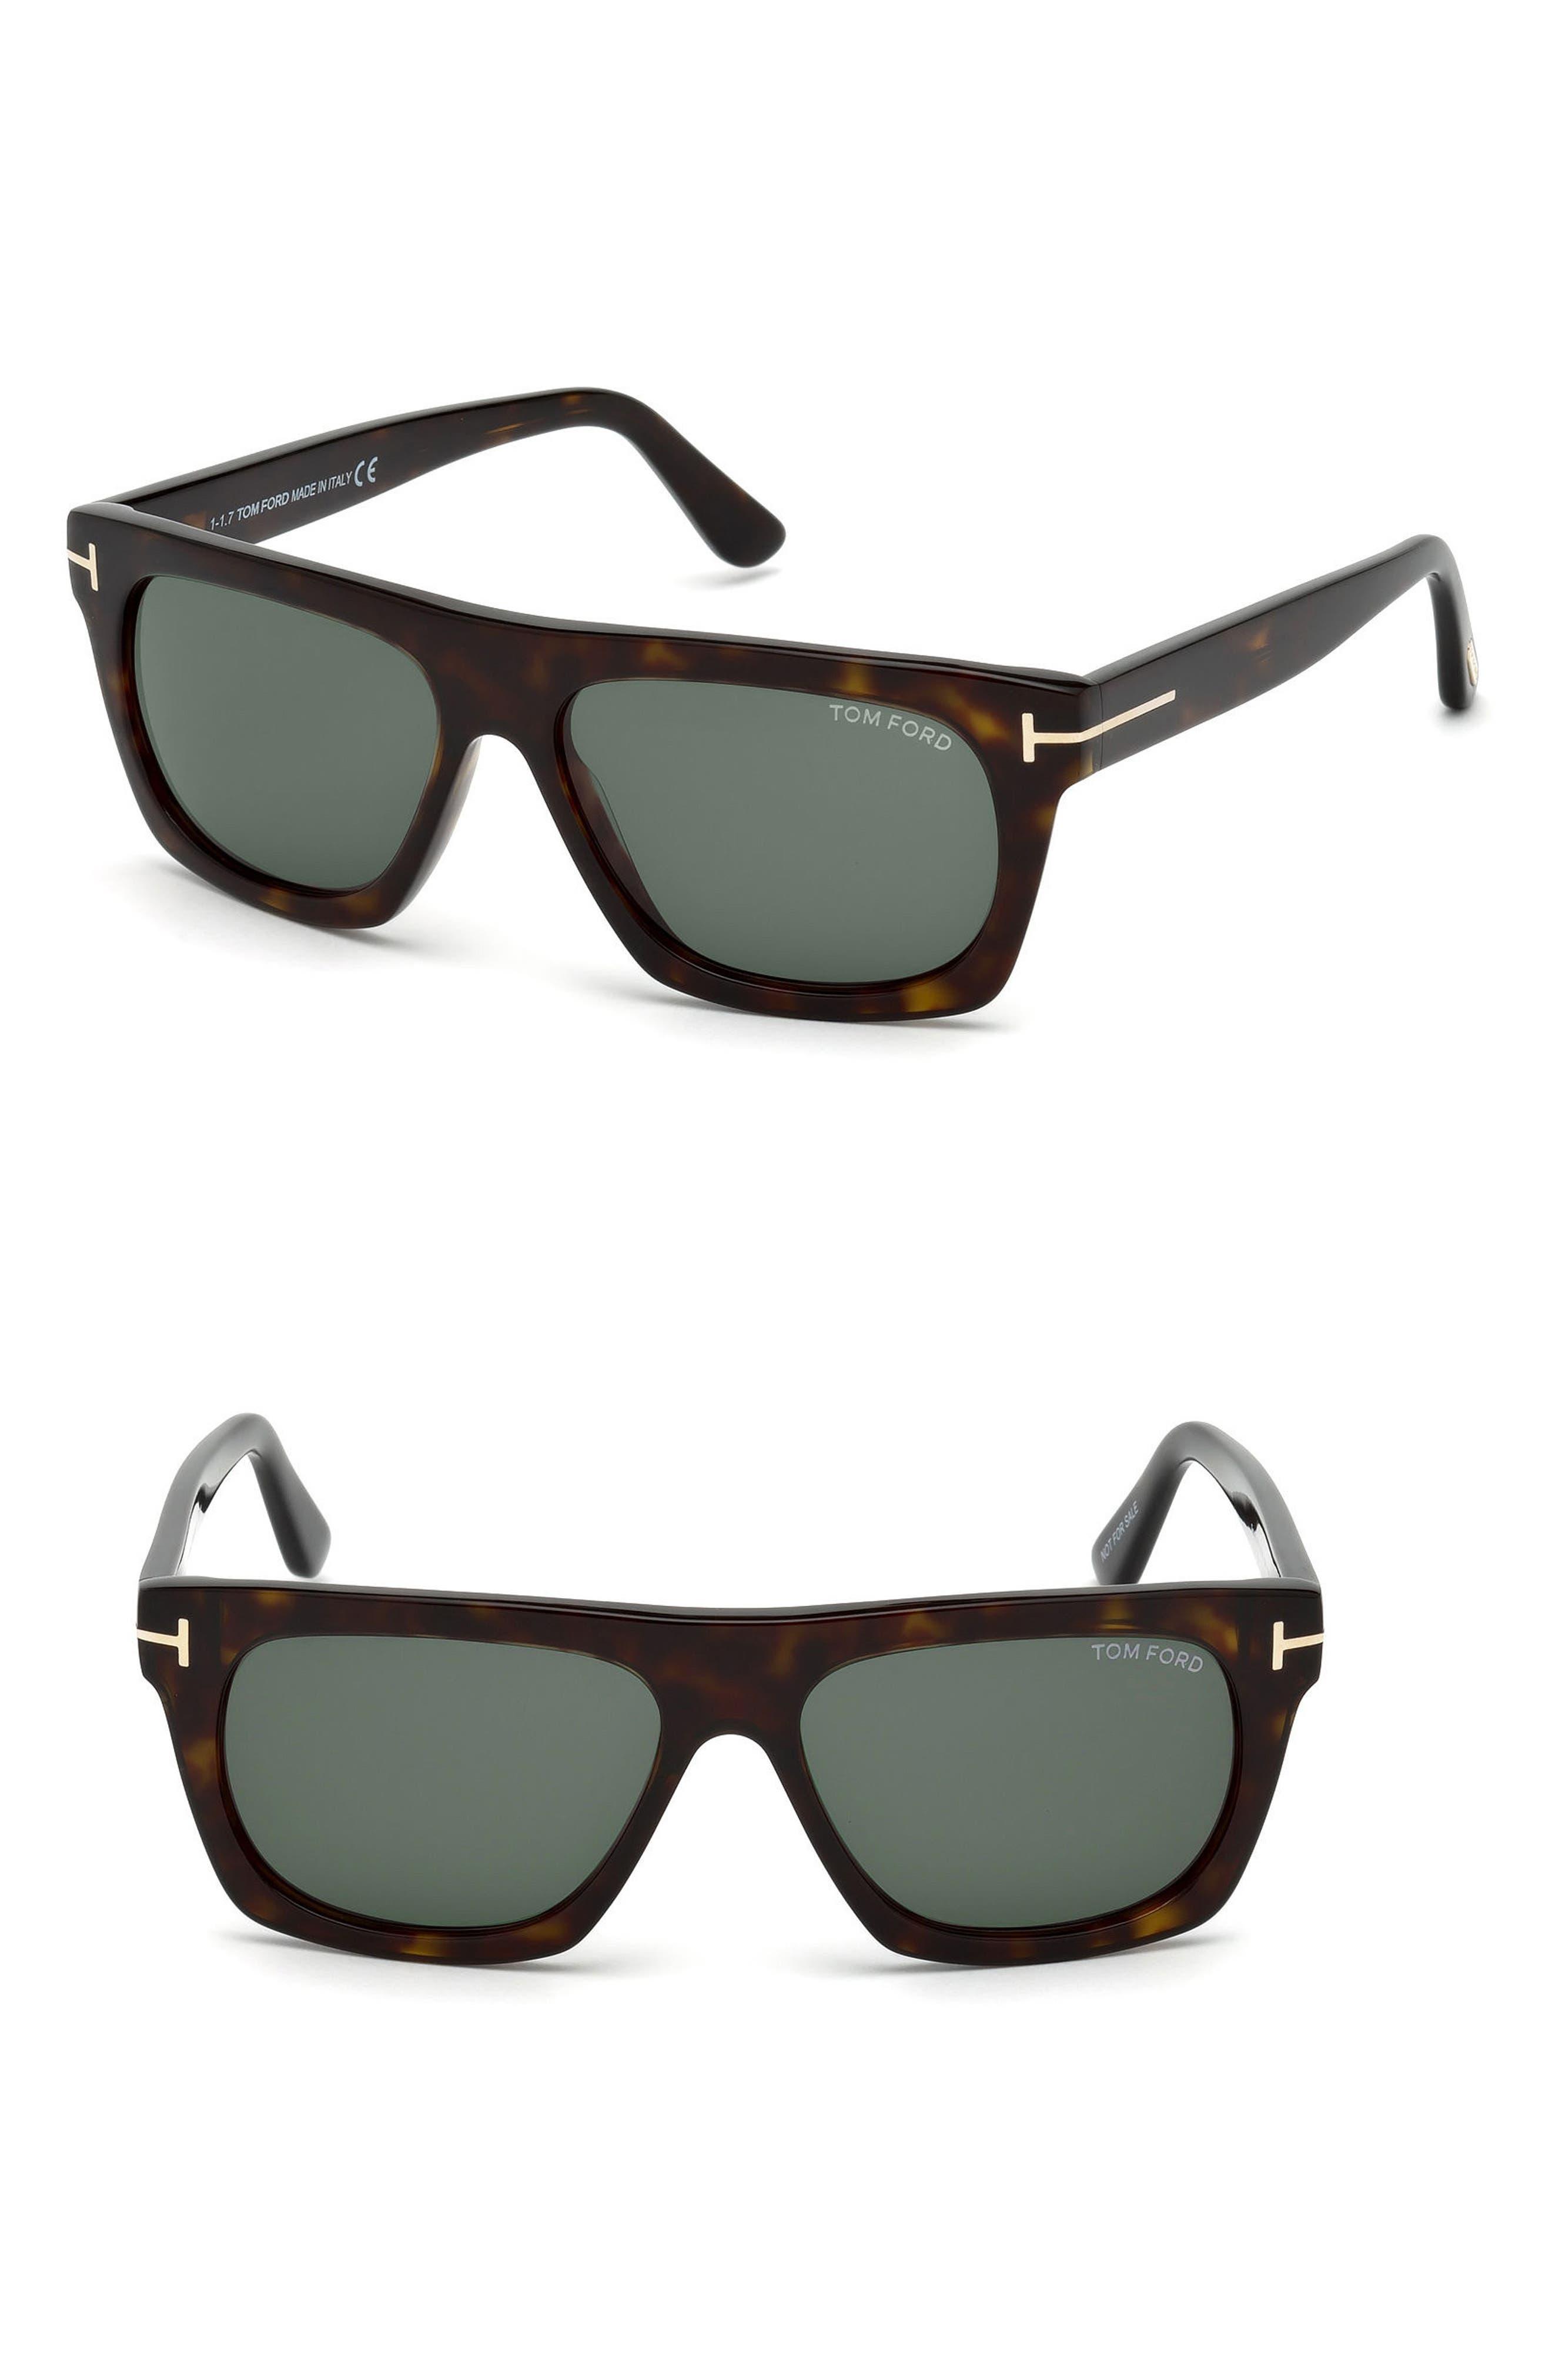 Ernesto 55mm Sunglasses,                             Main thumbnail 1, color,                             Dark Havana/ Green Lenses